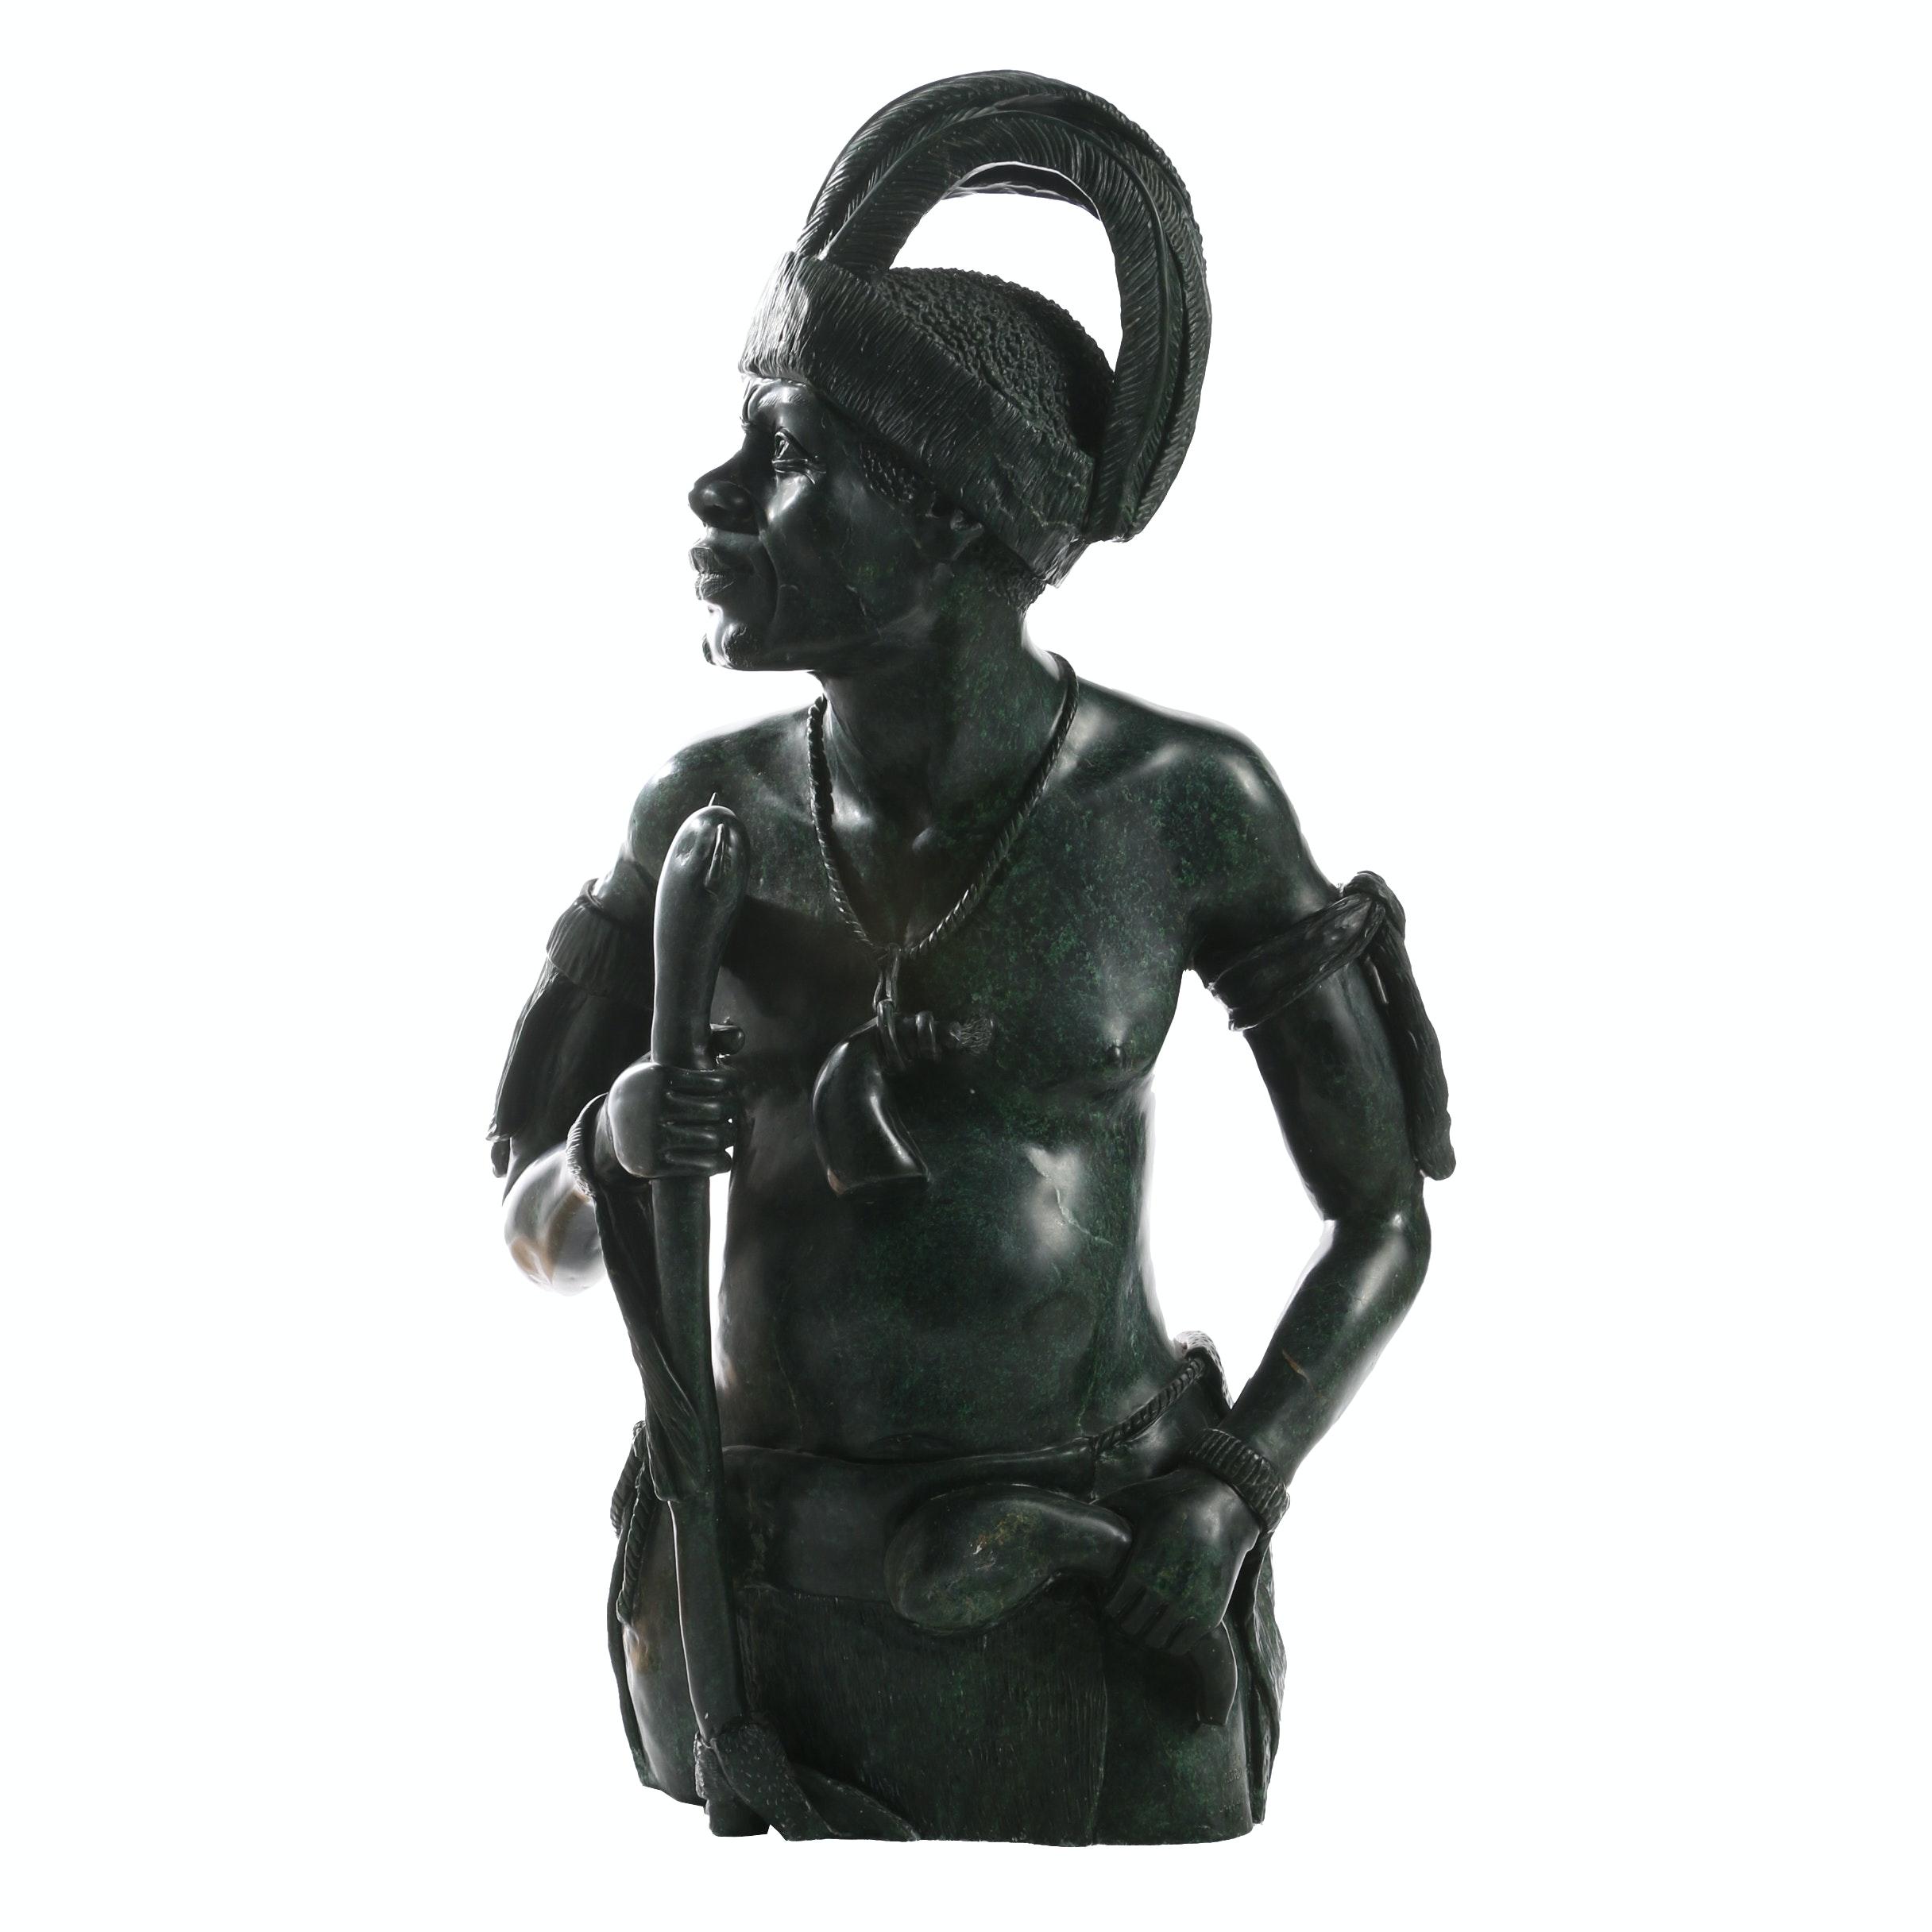 Abraham R. Chikumbirike Soapstone Sculpture